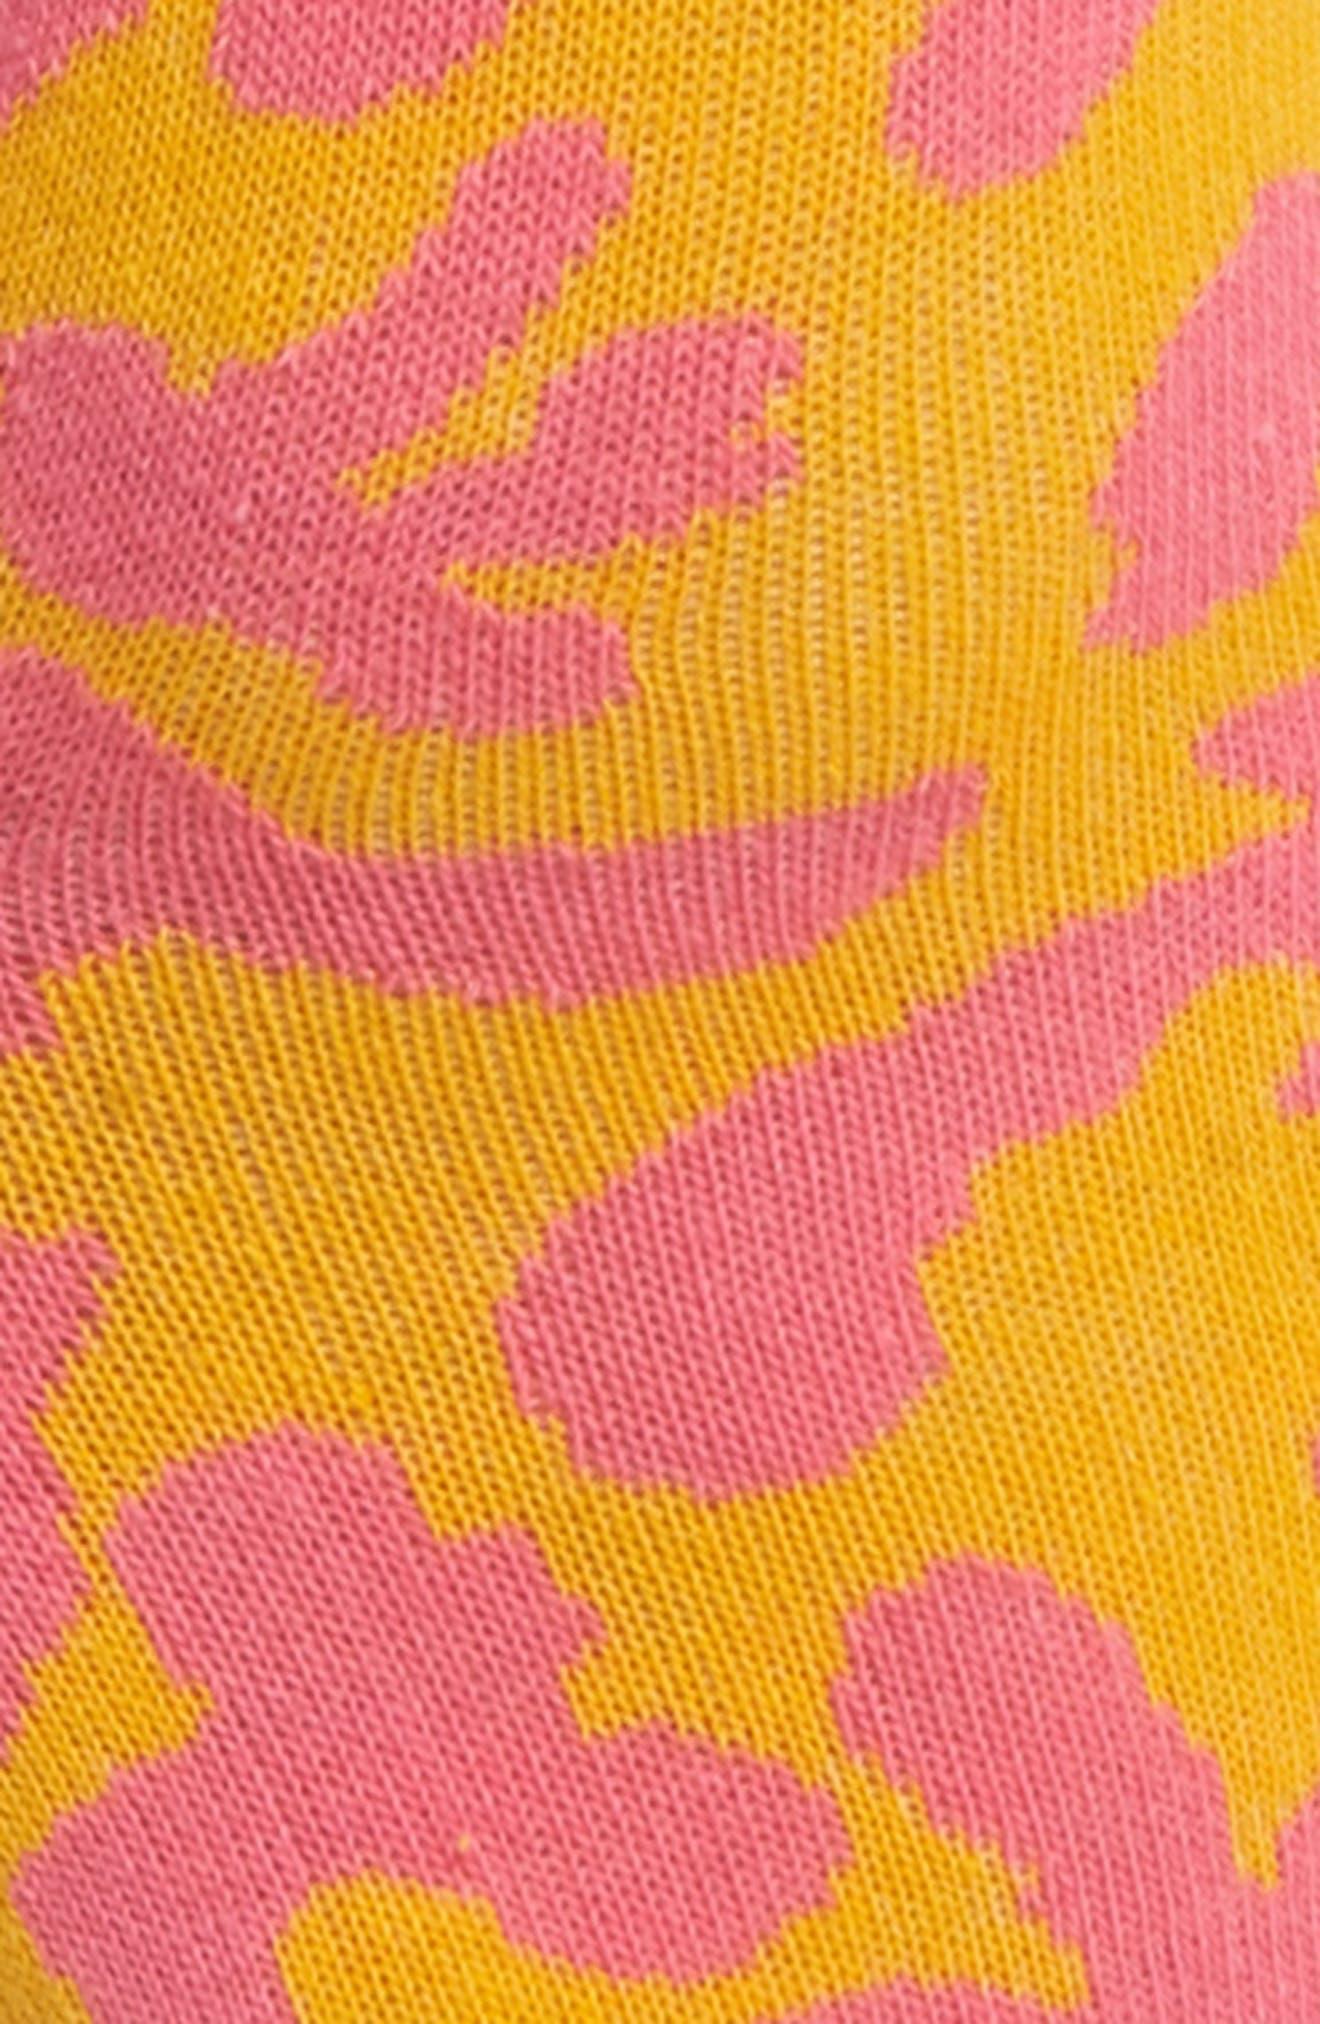 Coral Will Bryant Crew Socks,                             Alternate thumbnail 4, color,                             820